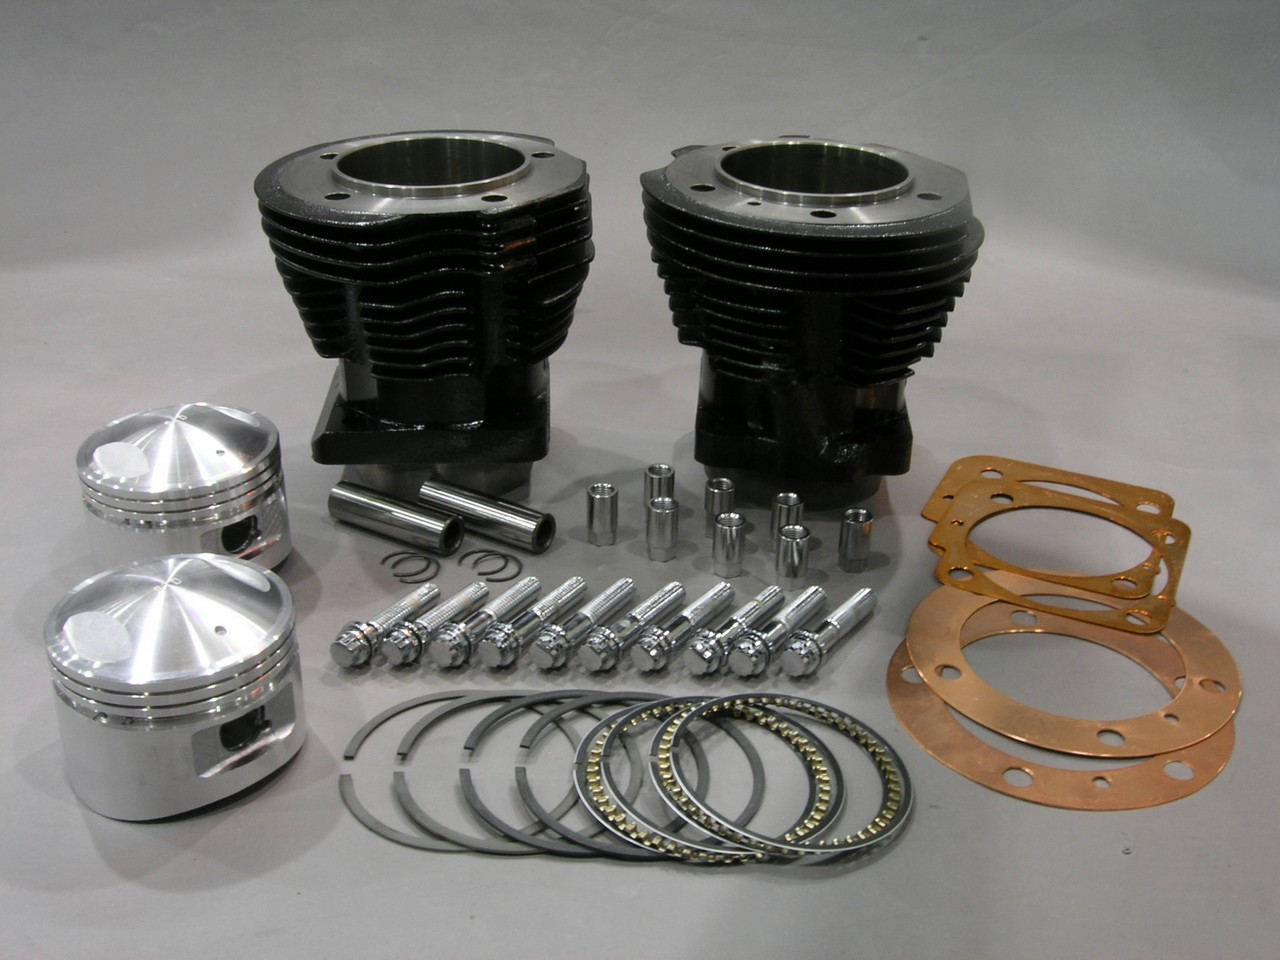 【SUNDANCE】3-5/8 Supertuff 汽缸套件 (附活塞) 舊型車用3-5/8 缸徑球墨鑄鐵汽缸套件 - 「Webike-摩托百貨」